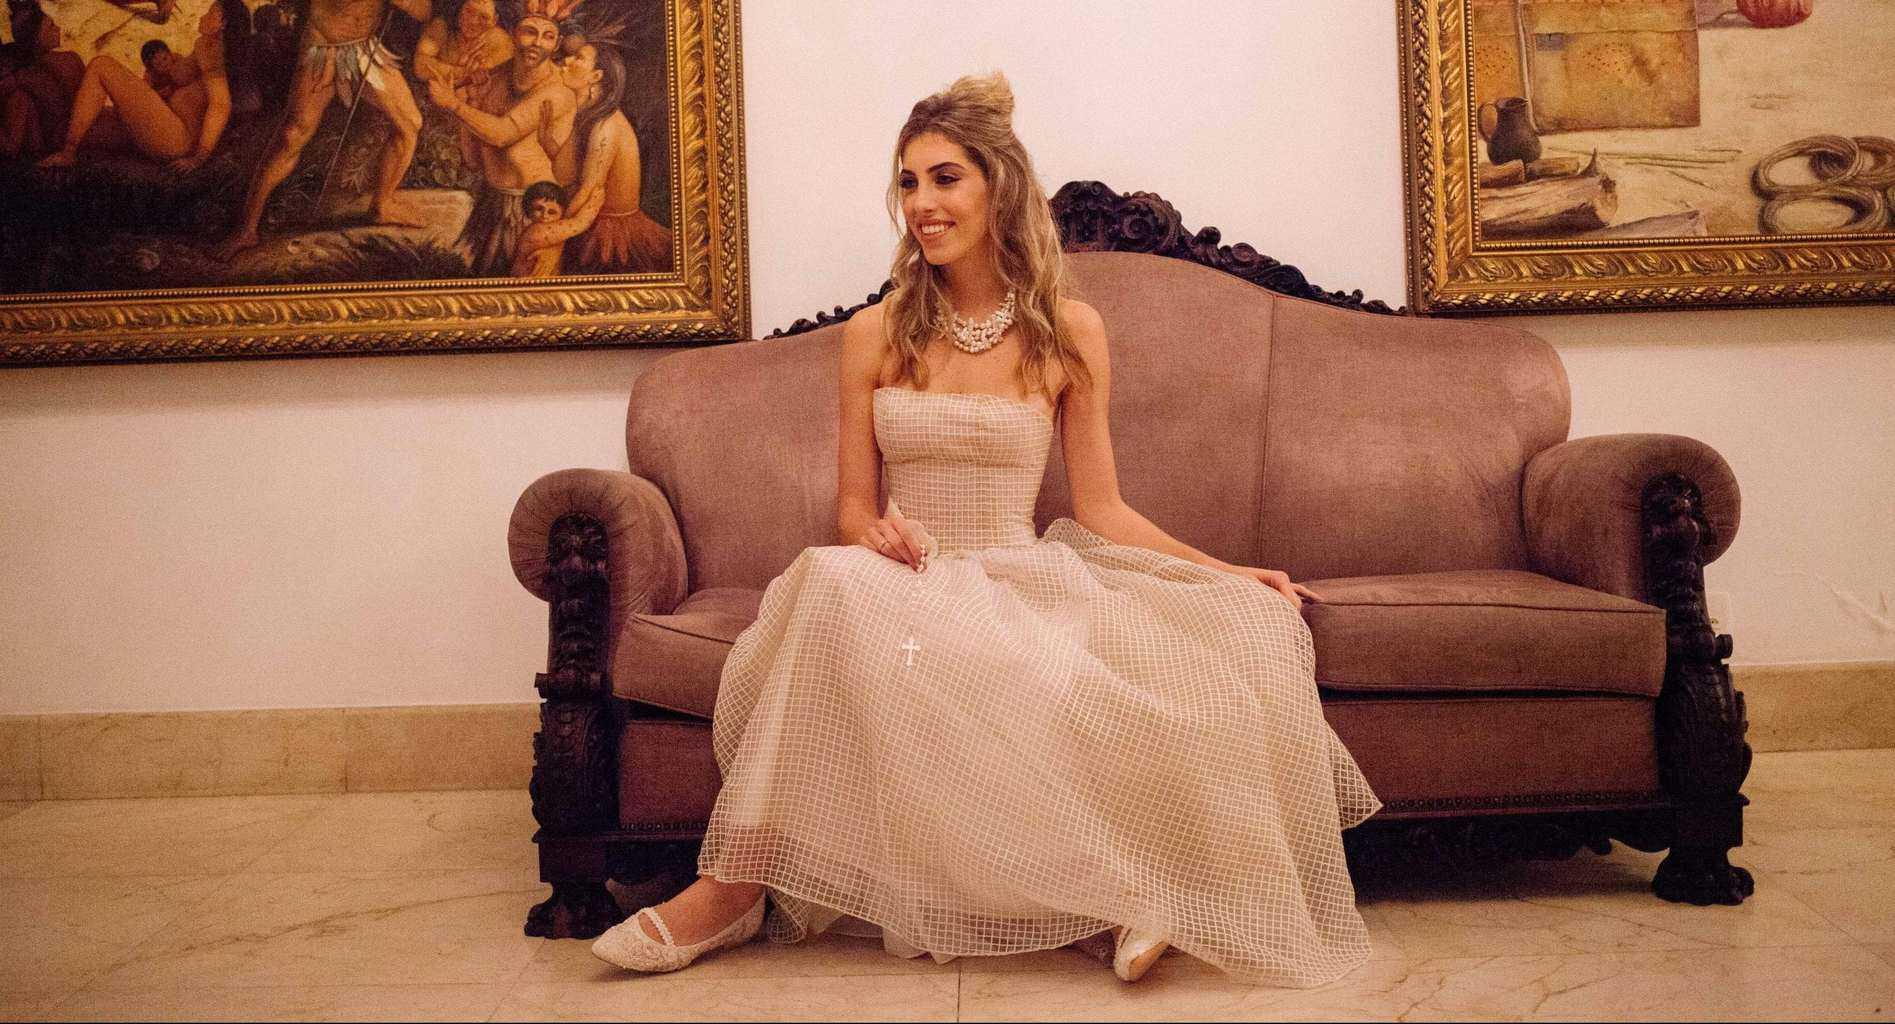 casamento-casamento-de-dia-cerimonia-Cissa-Sannomiya-Clube-Hipico-de-Santo-Amaro-igreja-marina-e-josé-Miguel-Kanashiro-casamento-2-e1533767543879